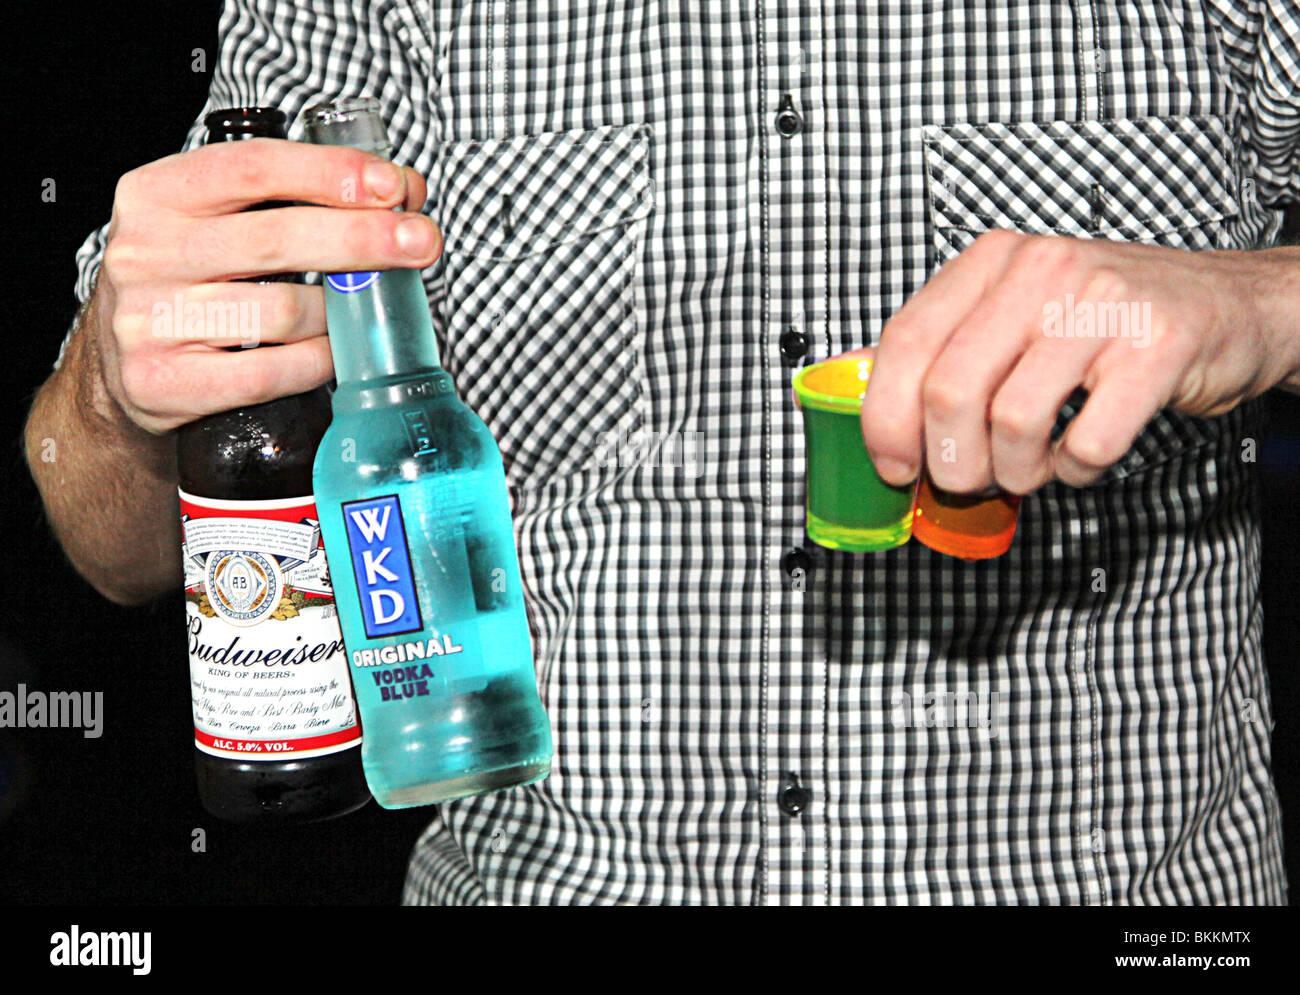 Man carrying bud, budweiser, wkd, original, drink, shots back from the bar. Underage drinking. binge drink britian - Stock Image